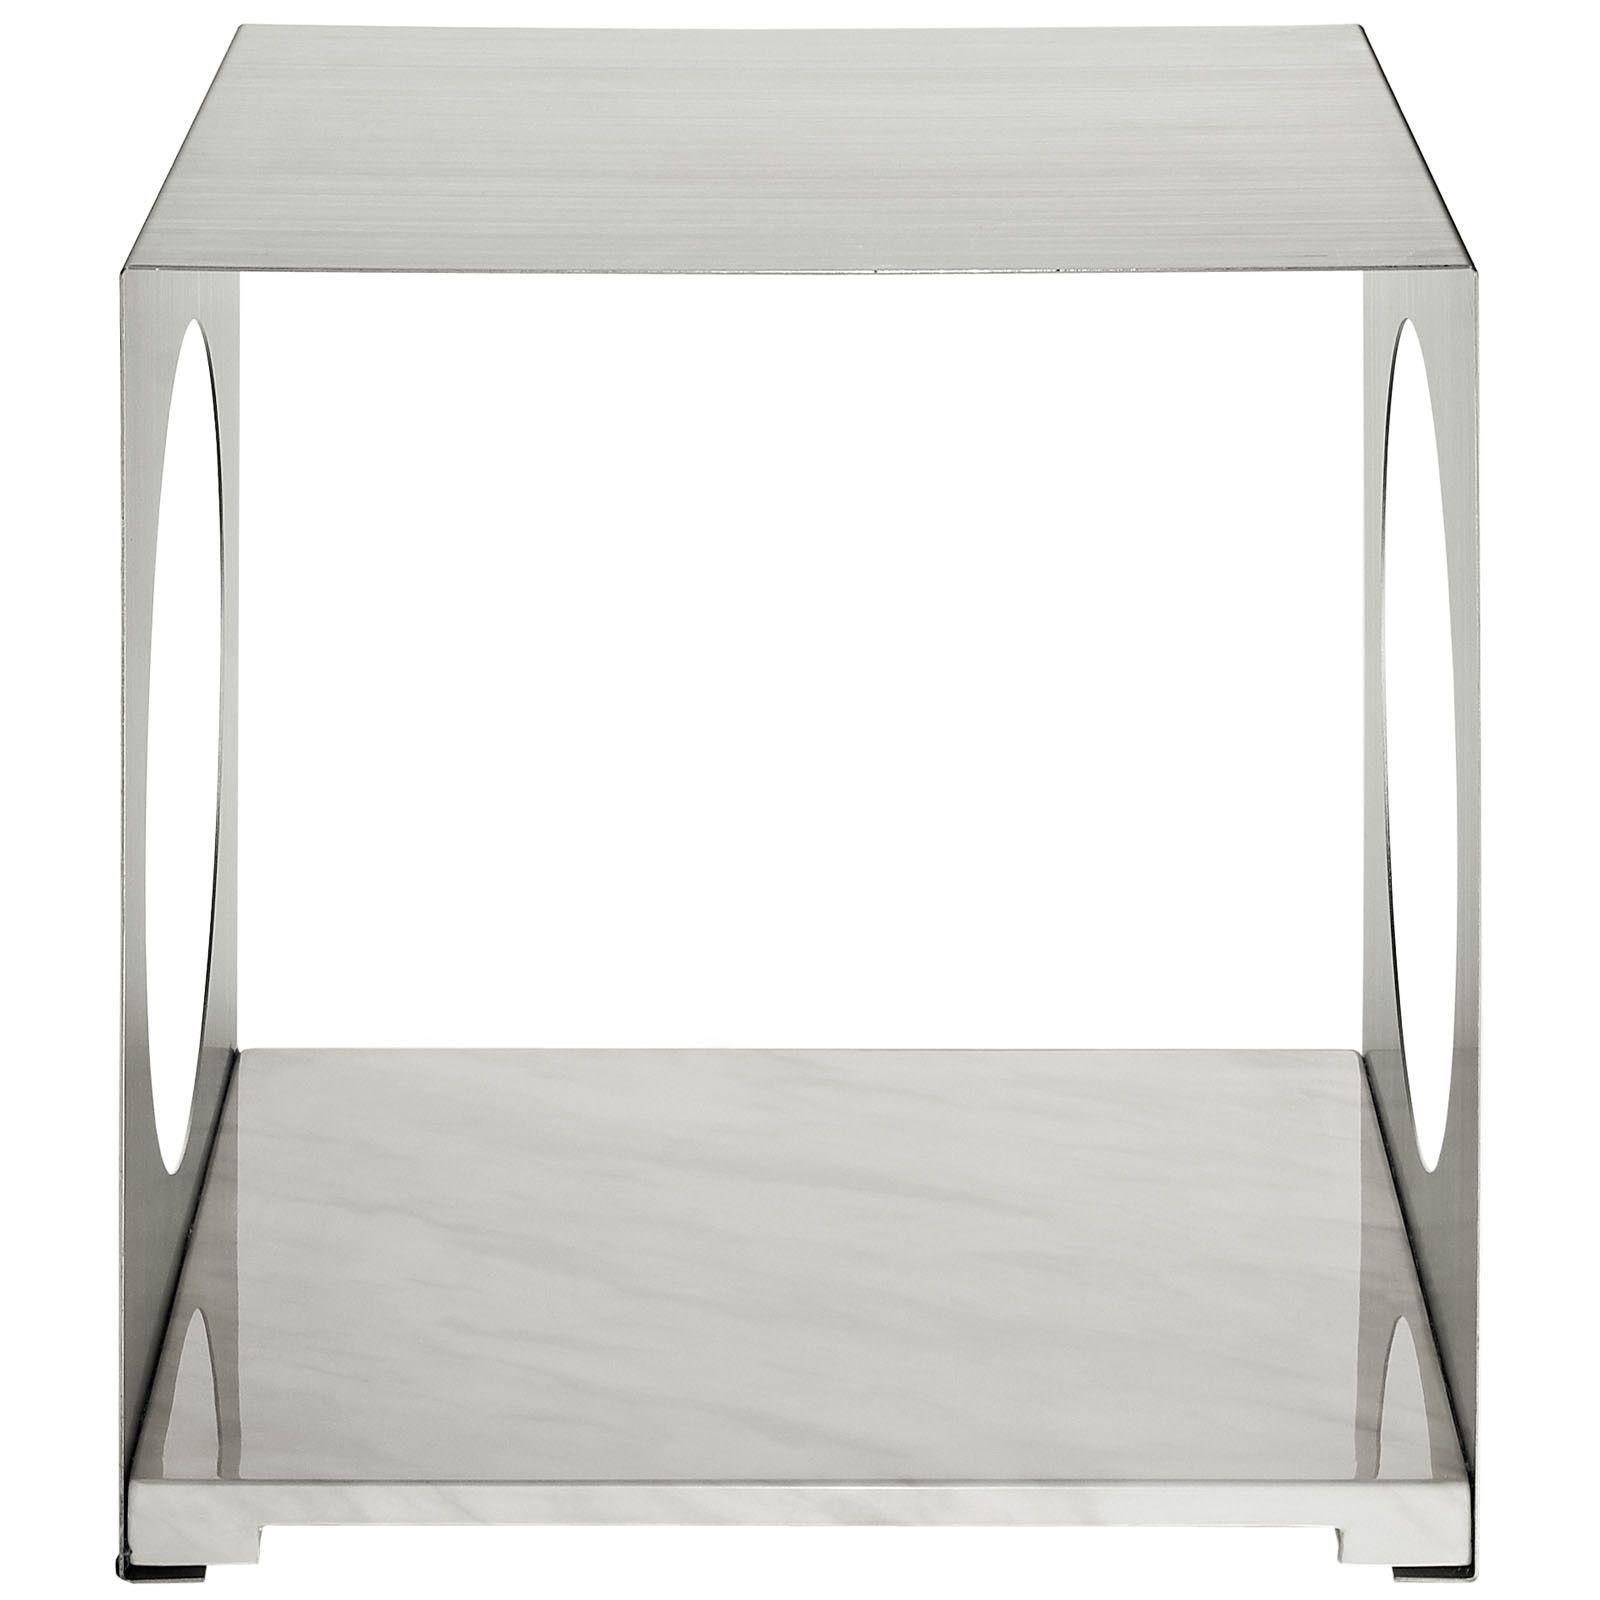 Modway Surpass Side Table